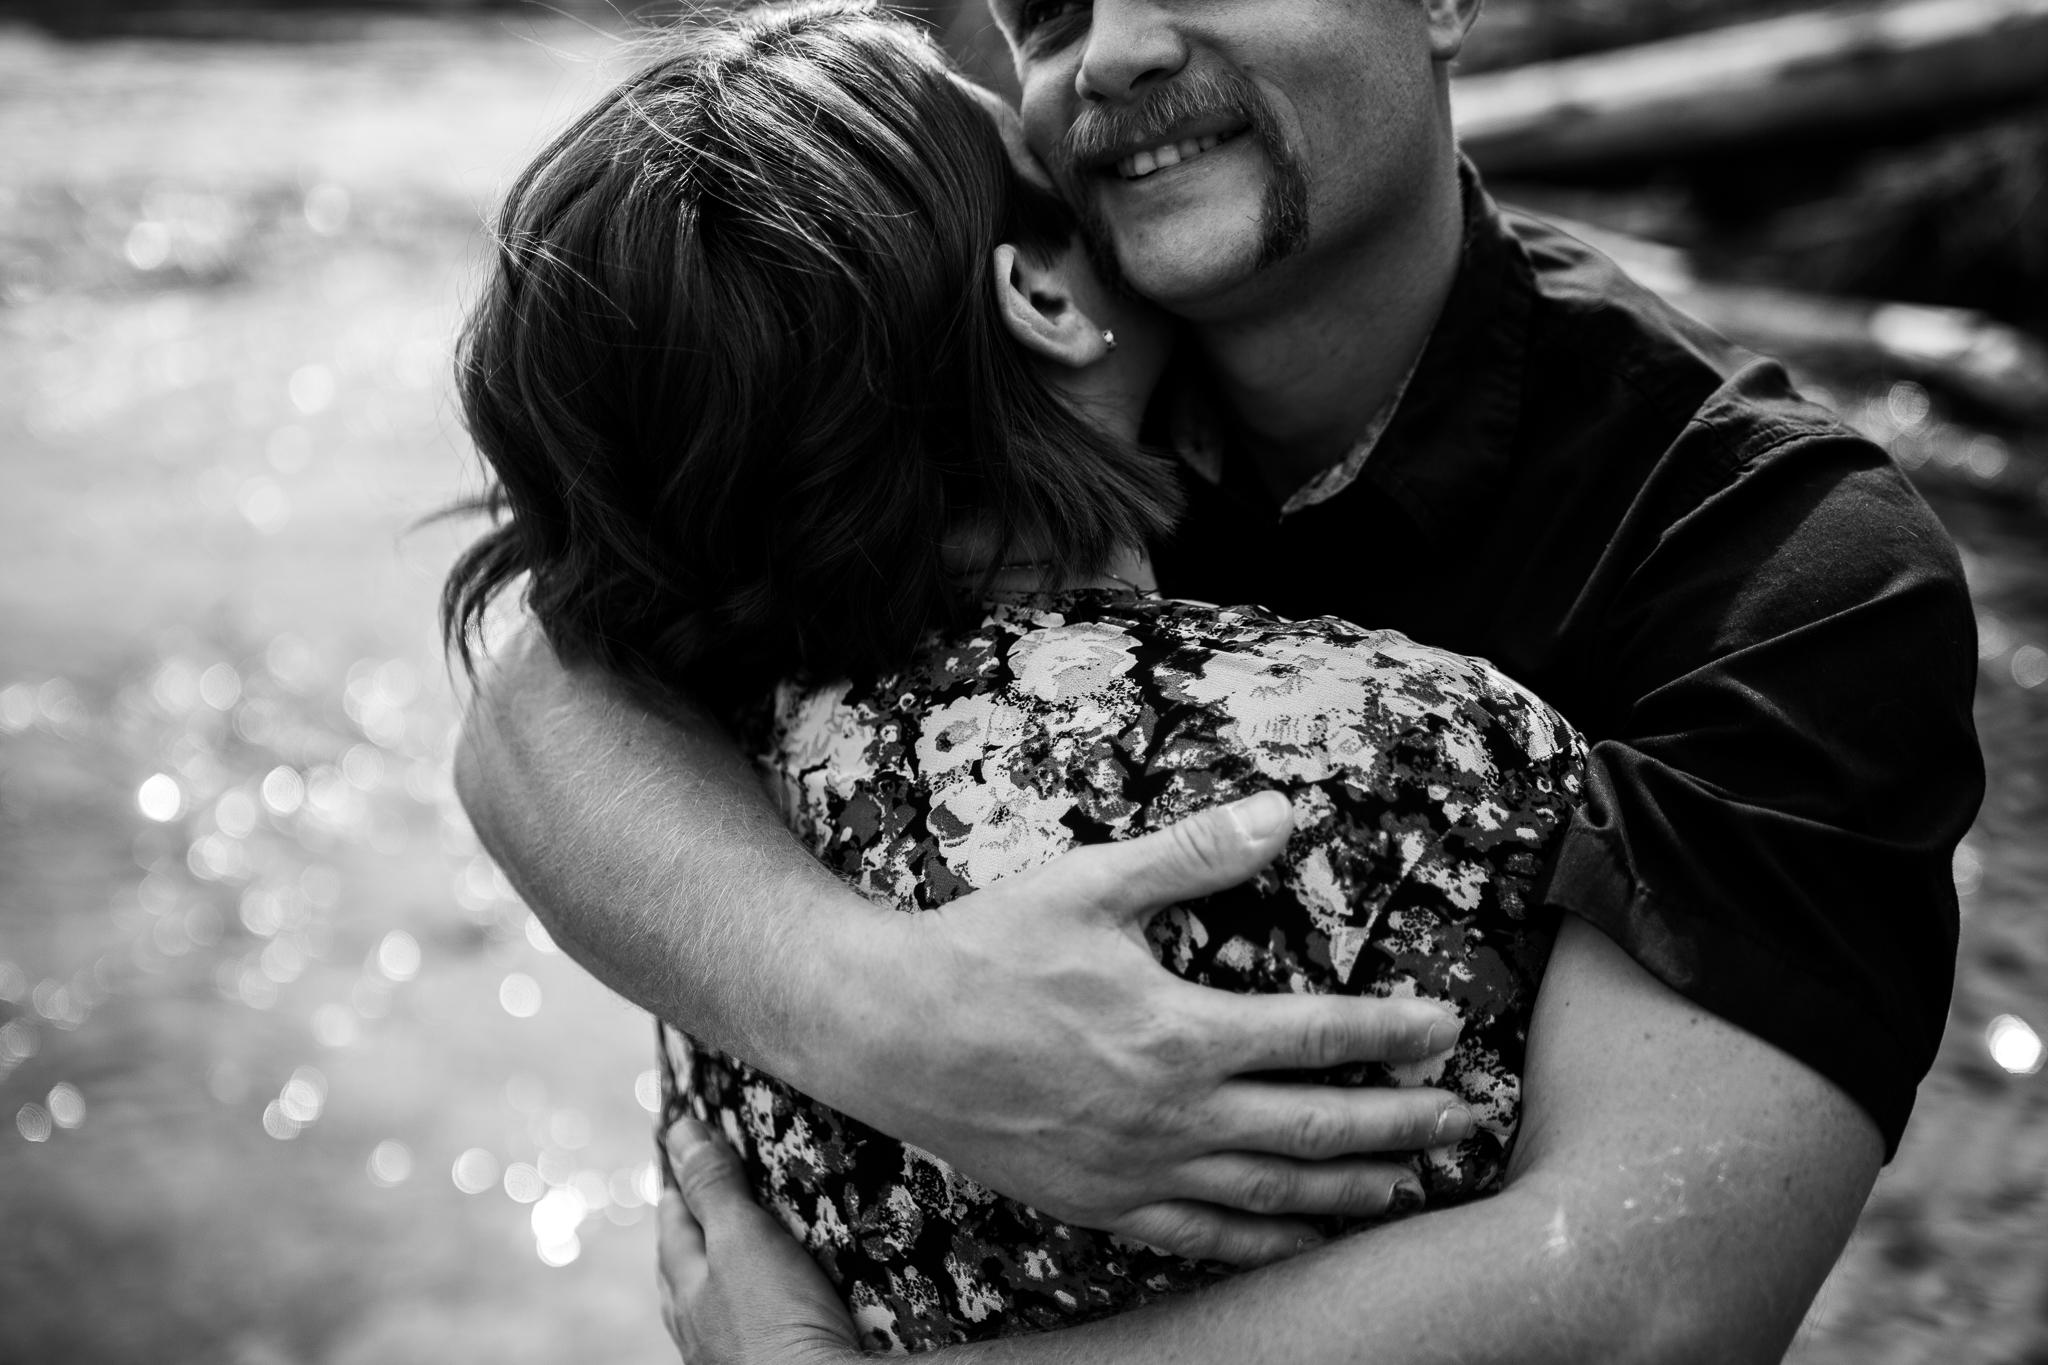 Chilliwack River Bank Mountain Chilliwack Fun  Engagement Photographer 132.jpg